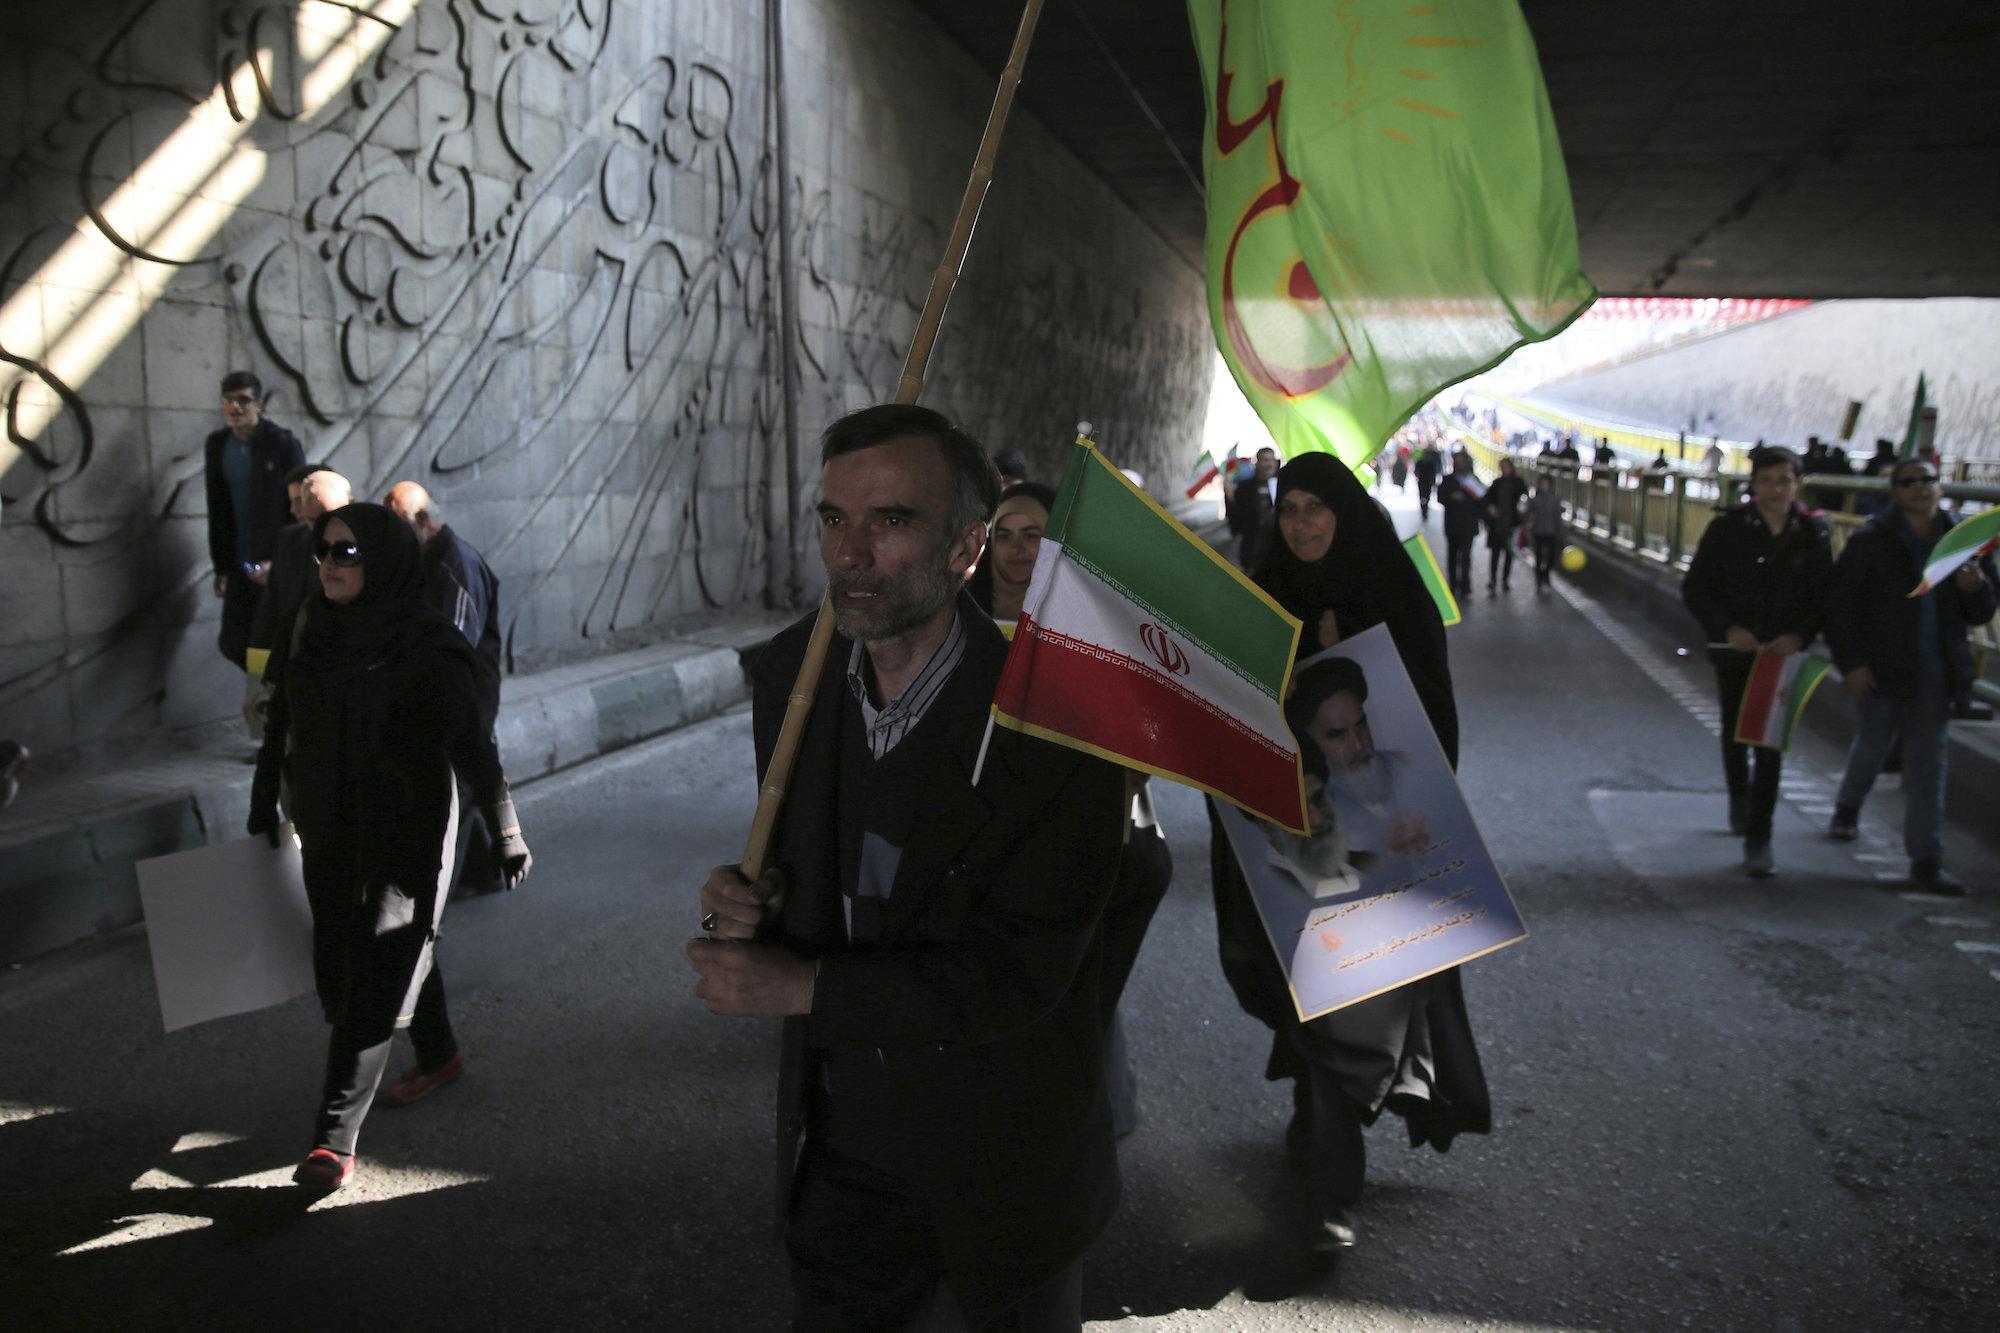 Iranians attend a rally marking the 39th anniversary of the 1979 Islamic Revolution, in Tehran, Iran, Feb. 11, 2018. (AP Photo/Vahid Salemi)